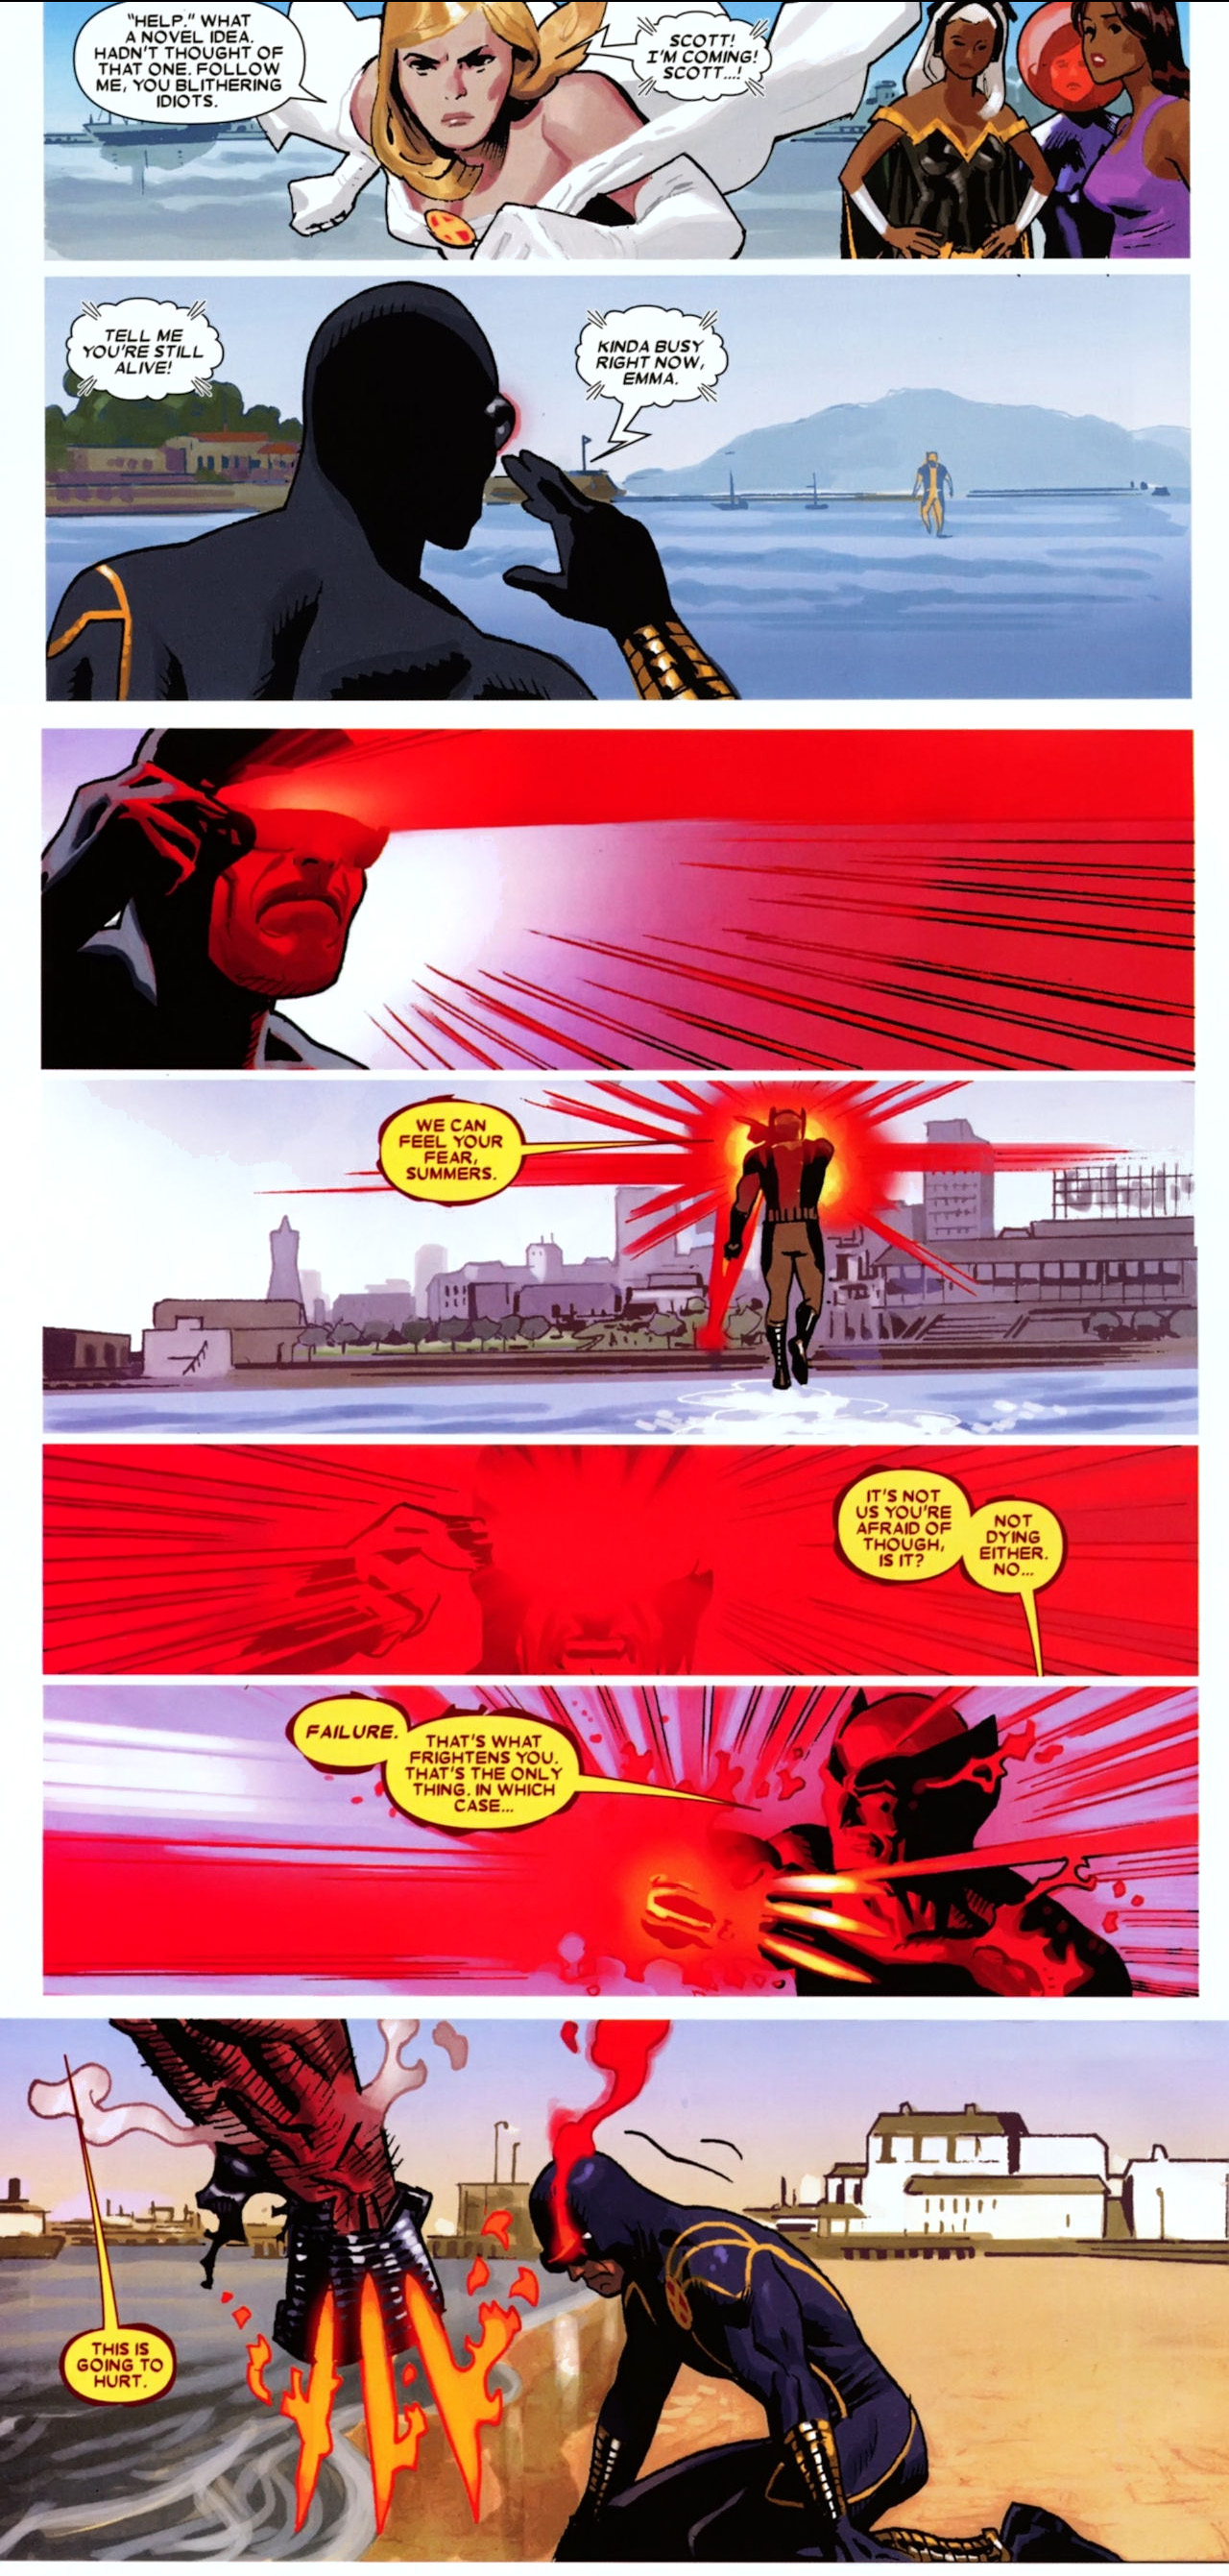 greatest fear of cyclops